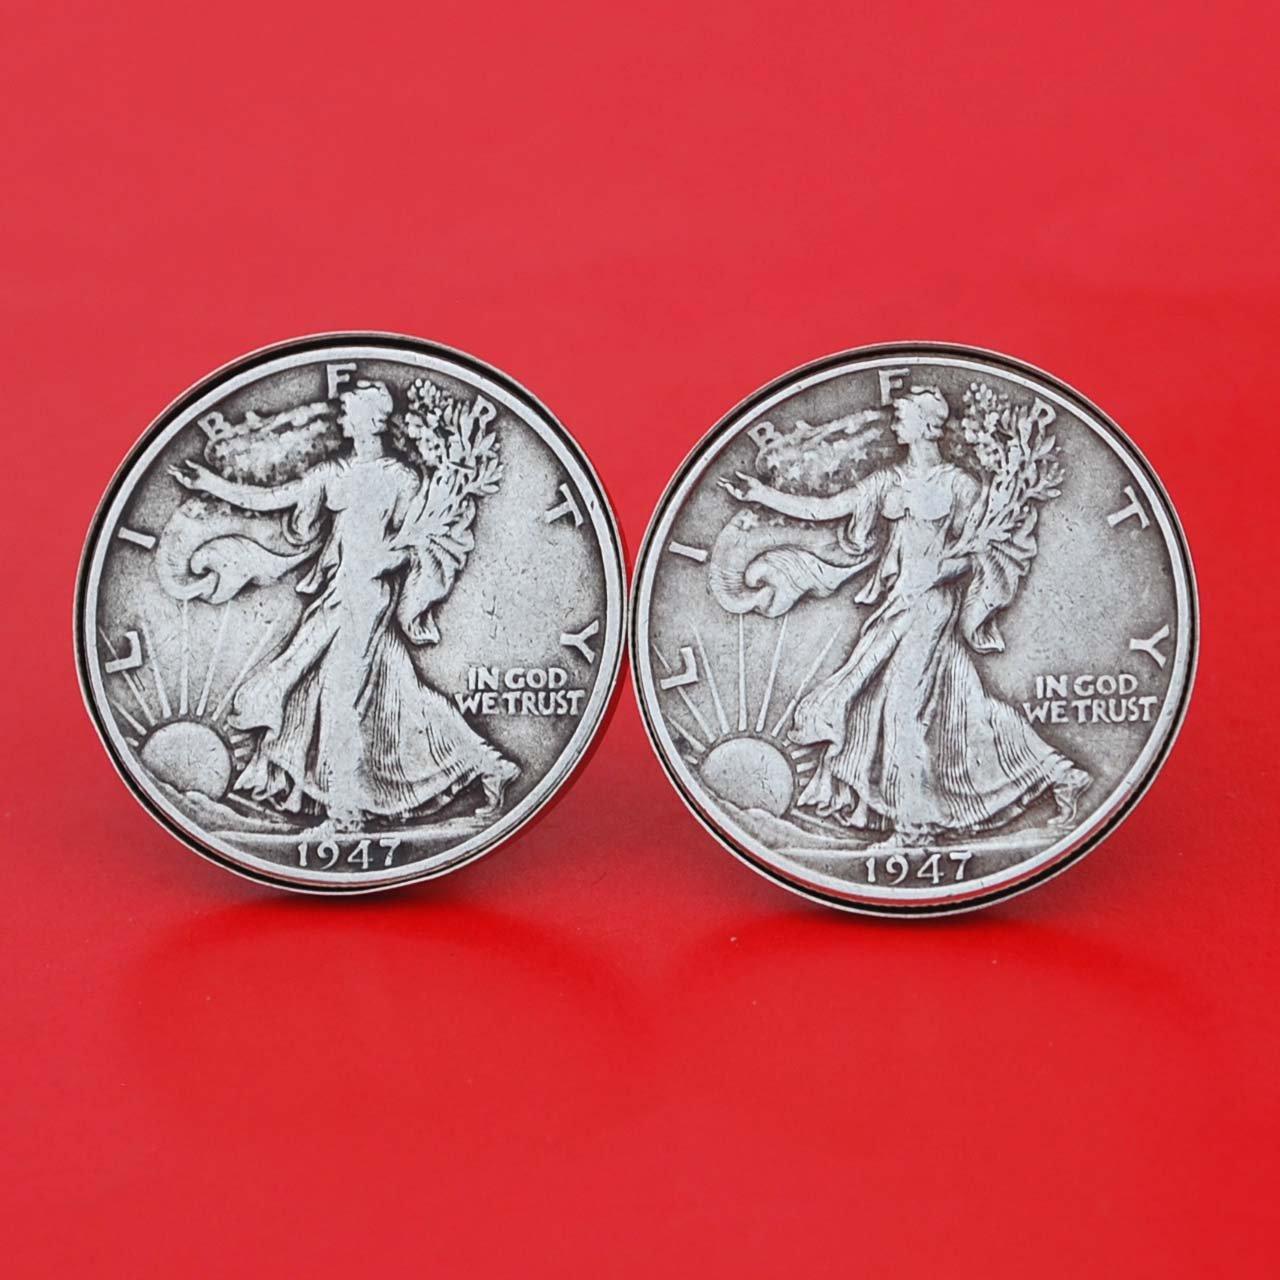 US 1947 Walking Liberty Half Dollar 90% Silver Coin Silver Cufflinks NEW